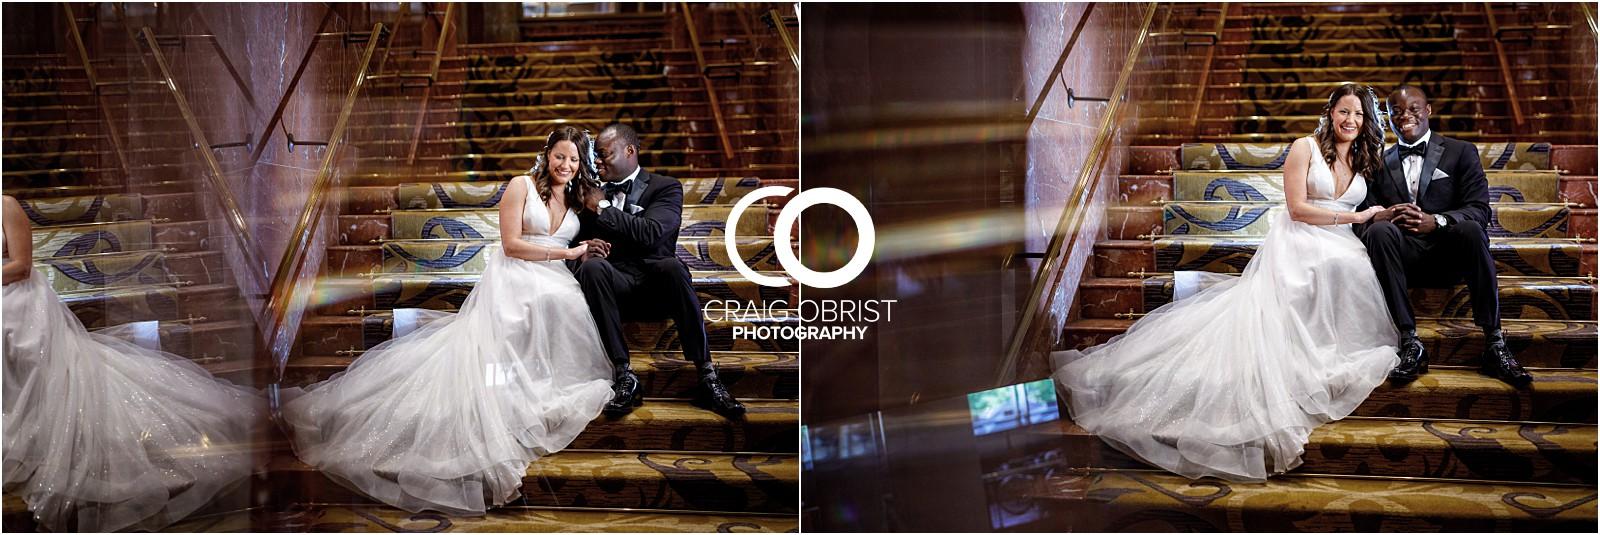 Four Seasons Atlanta Wedding_0031.jpg